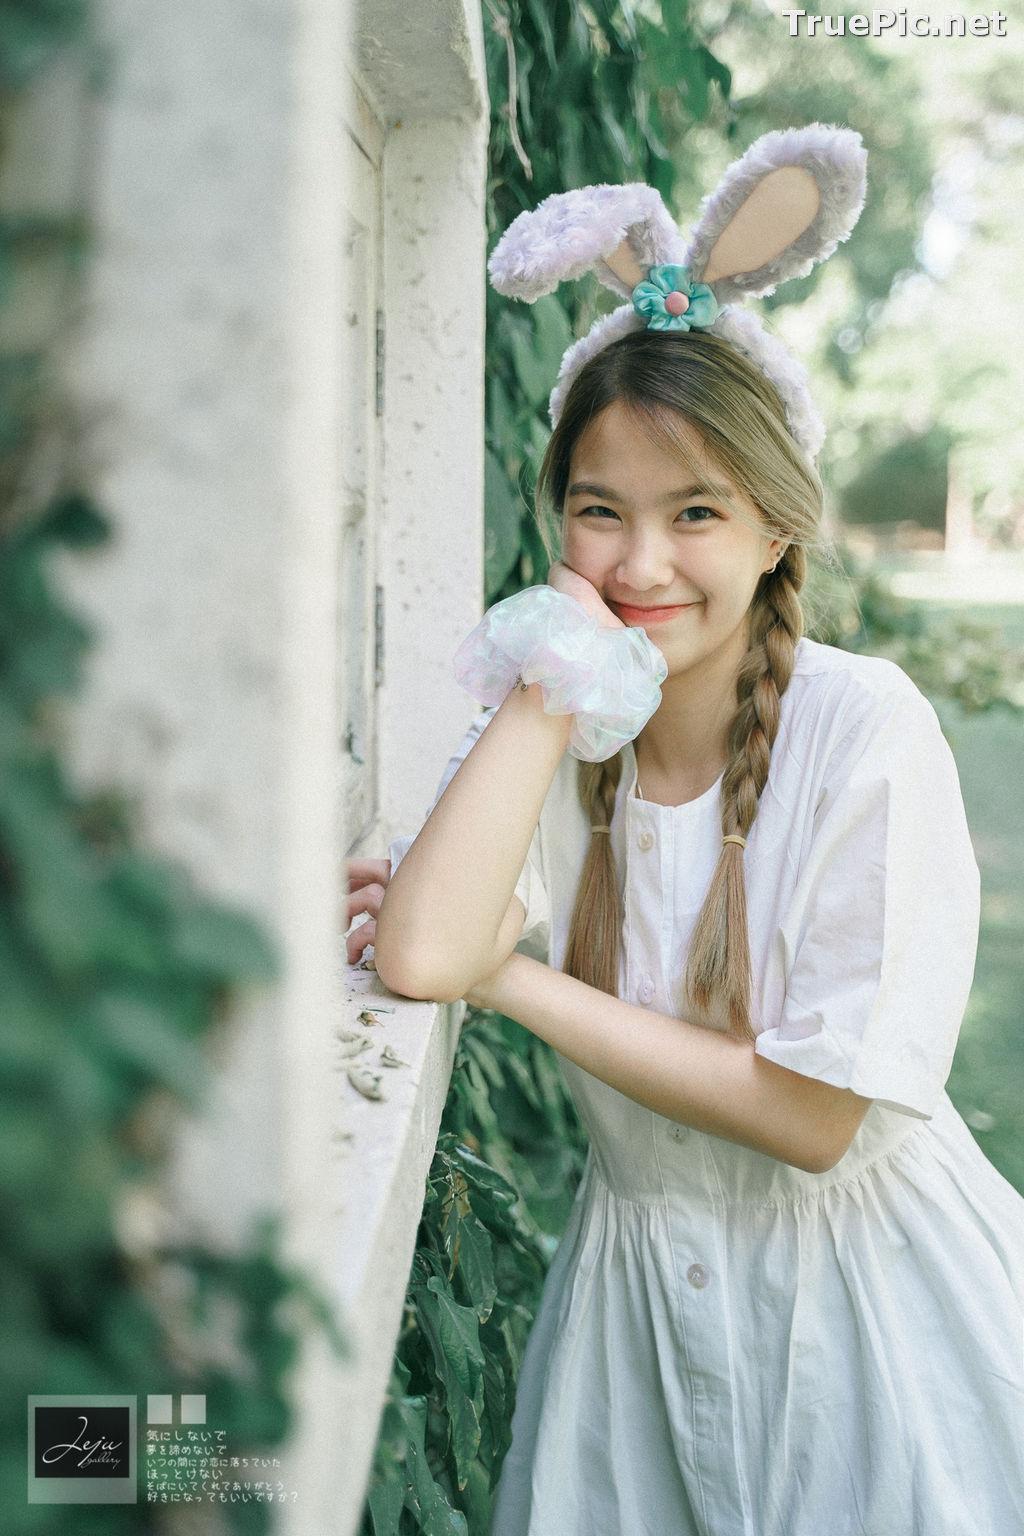 Image Thailand Cute Model - Napat Cdhg - Gam Bunny Girl - TruePic.net - Picture-7